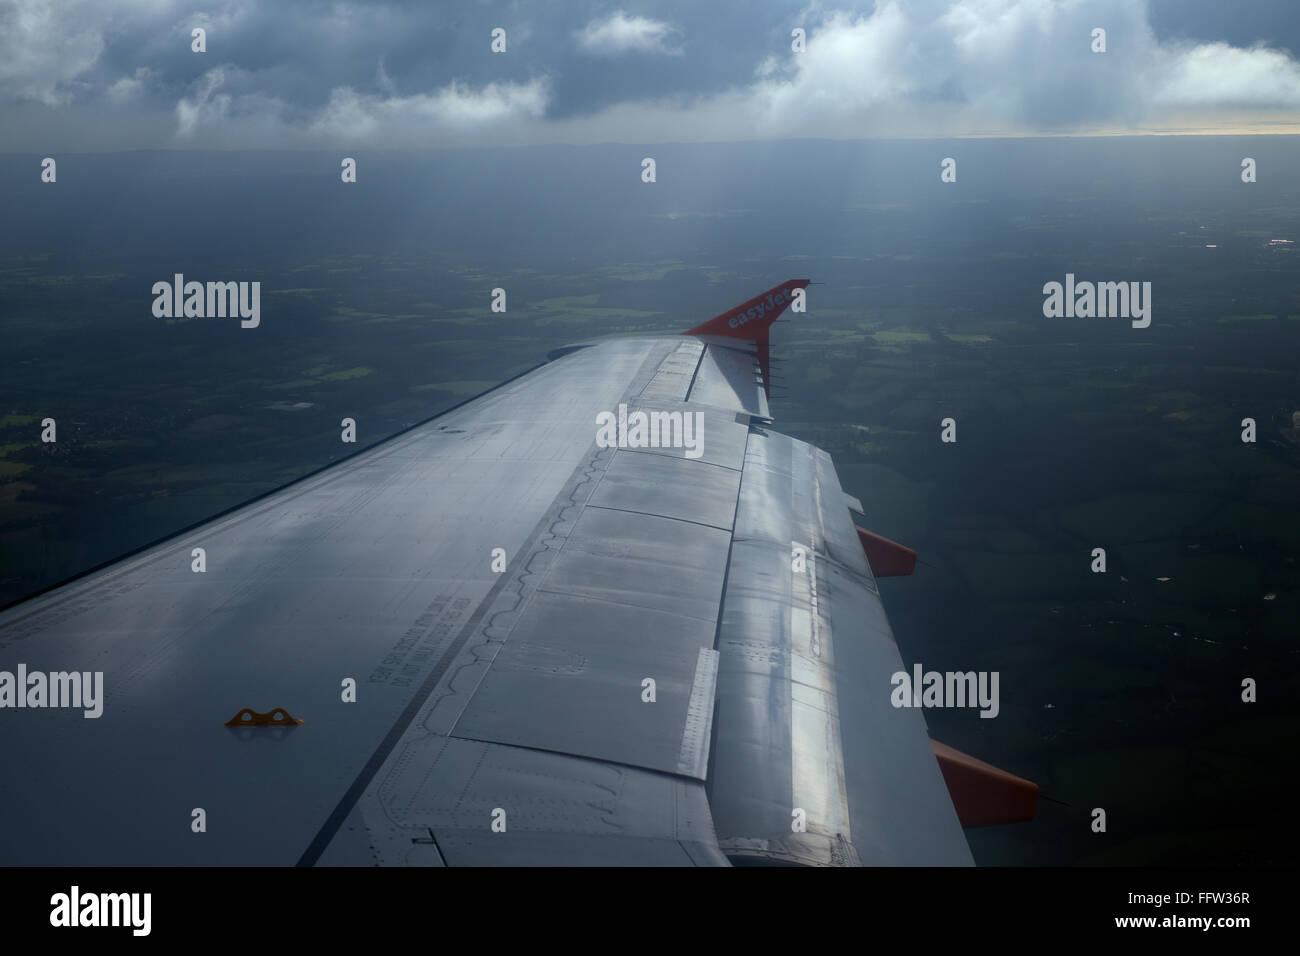 Easyjet plane in flight over the Netherlands - Stock Image